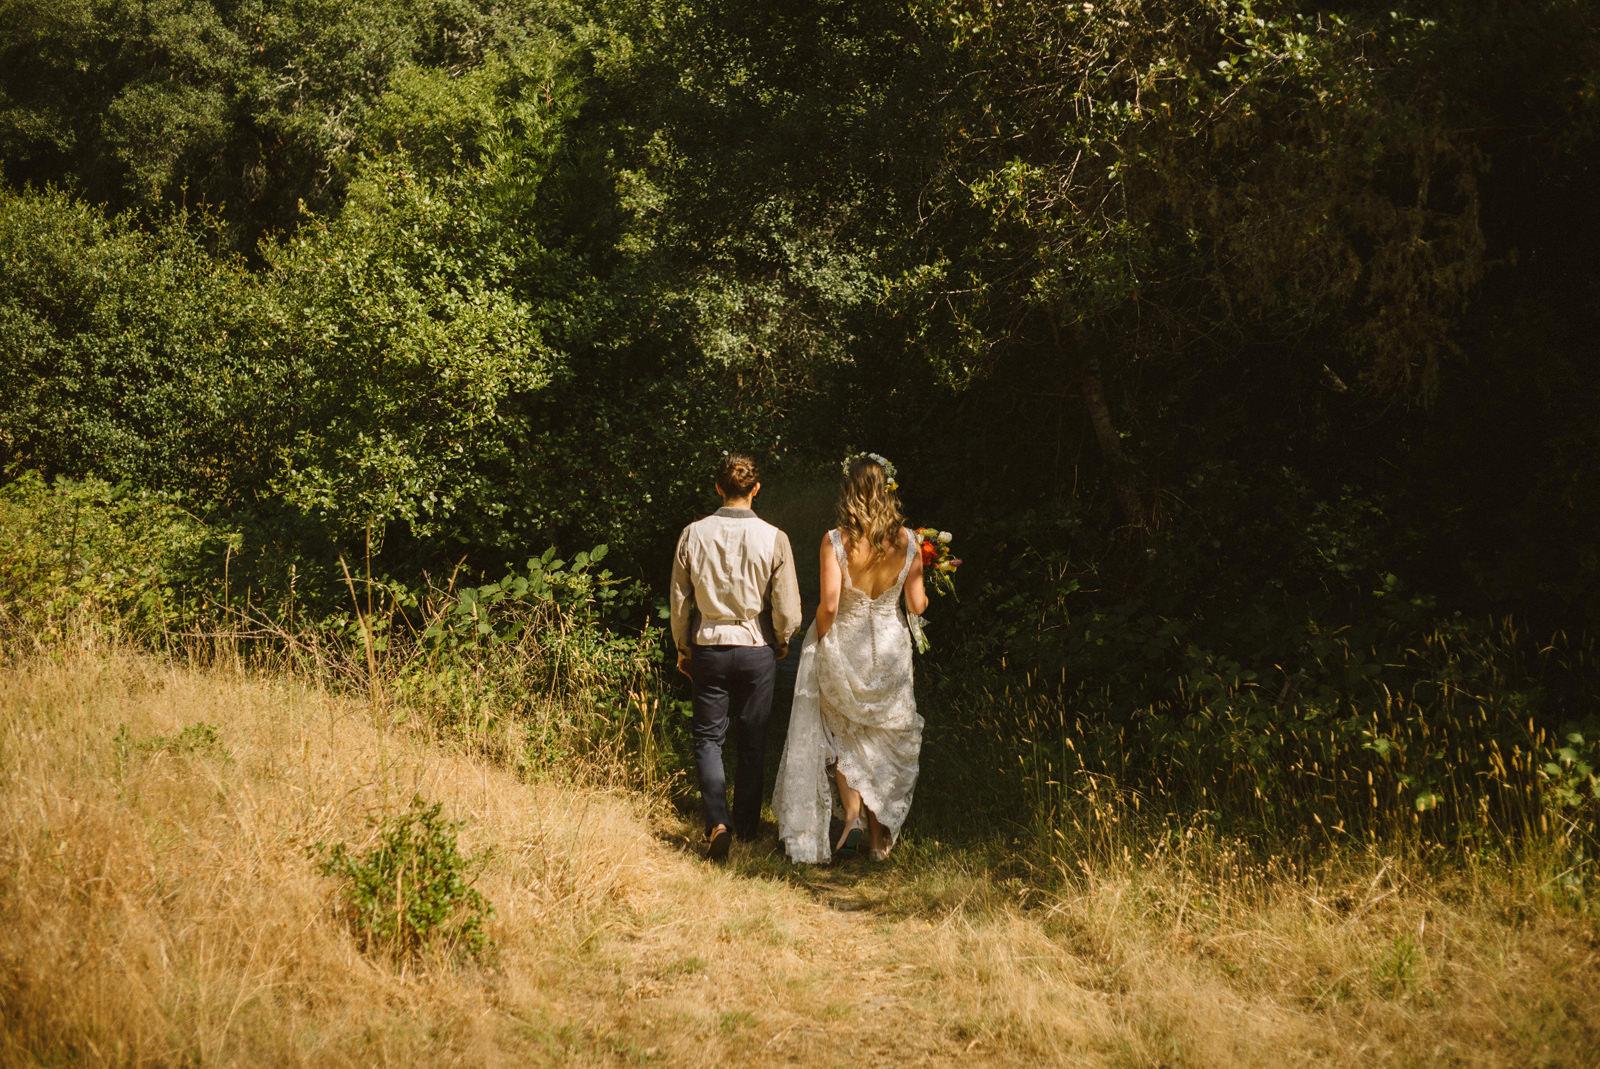 rivers-bend-retreat-wedding-049 RIVER'S BEND RETREAT WEDDING